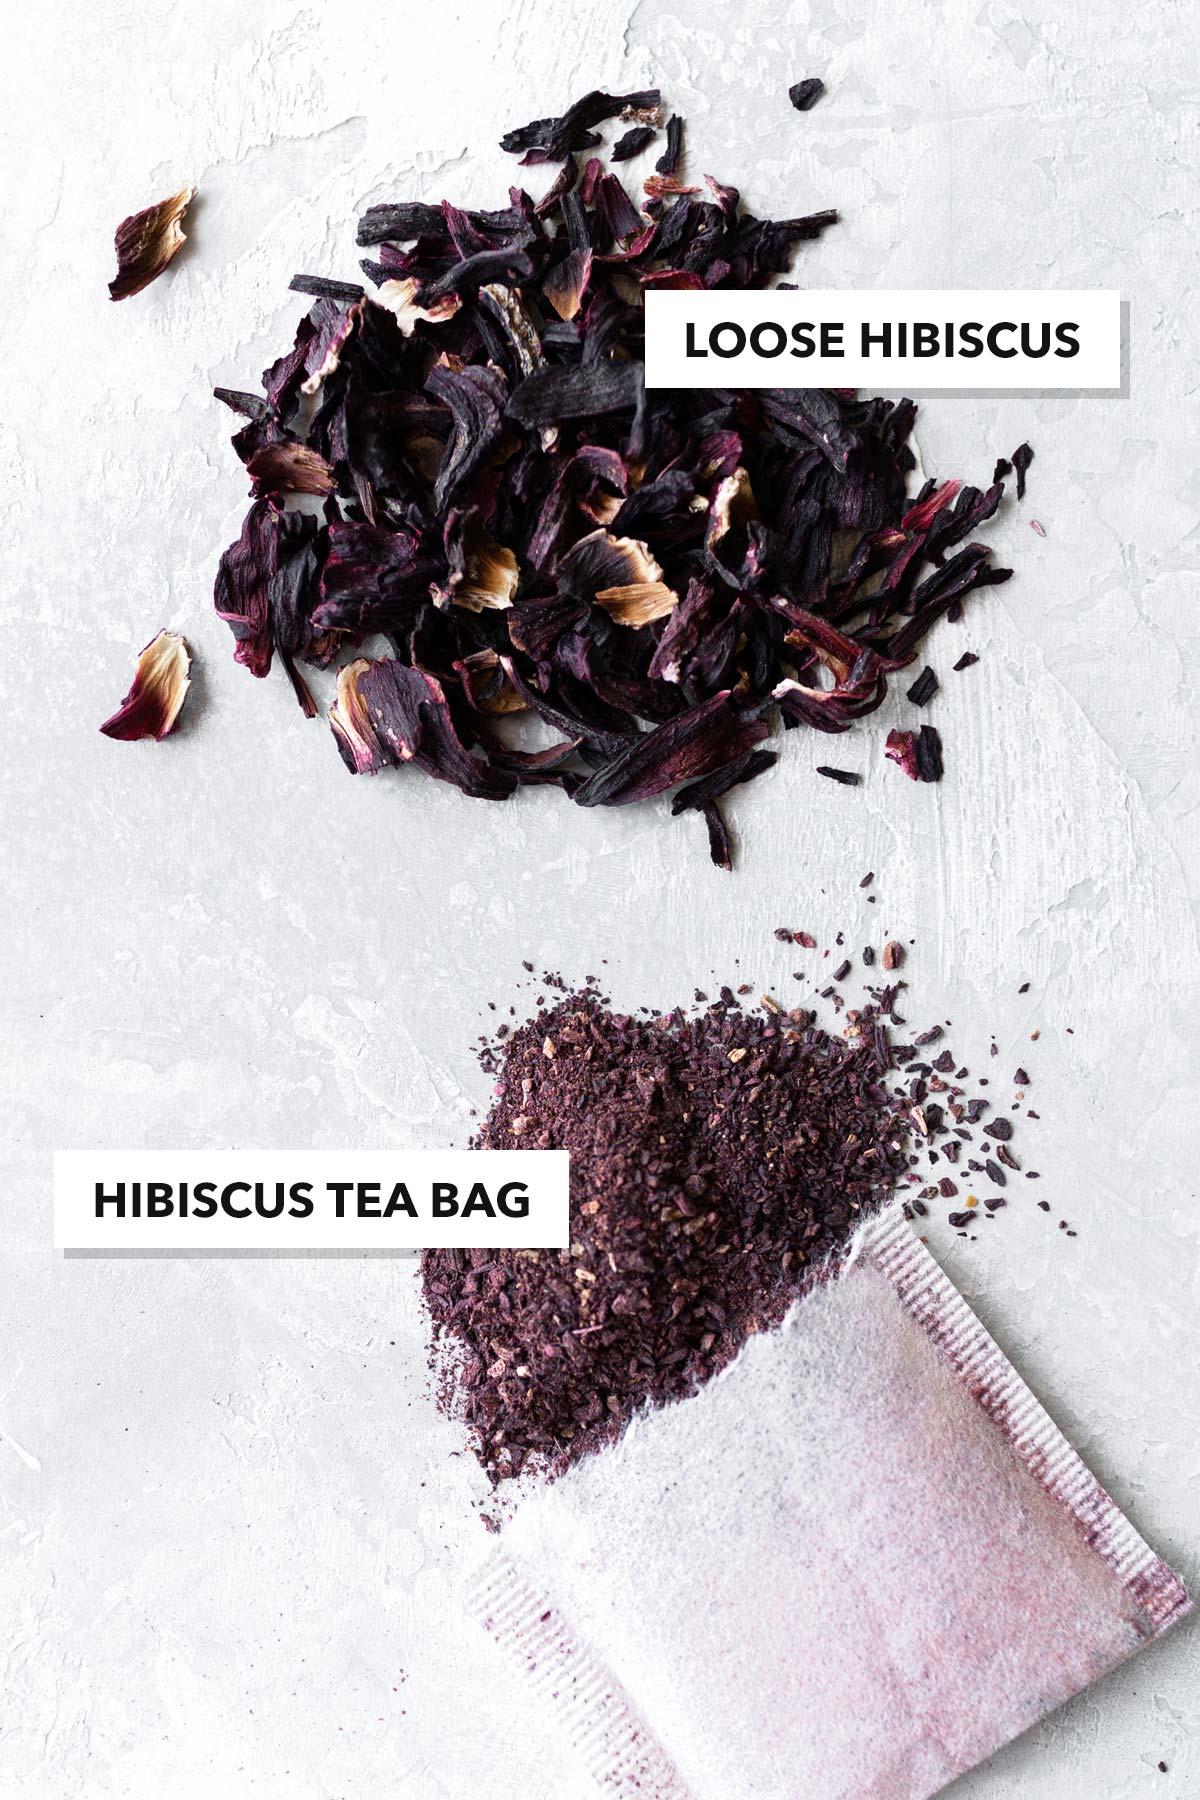 Hibiscus loose tea and hibiscus in tea bag.